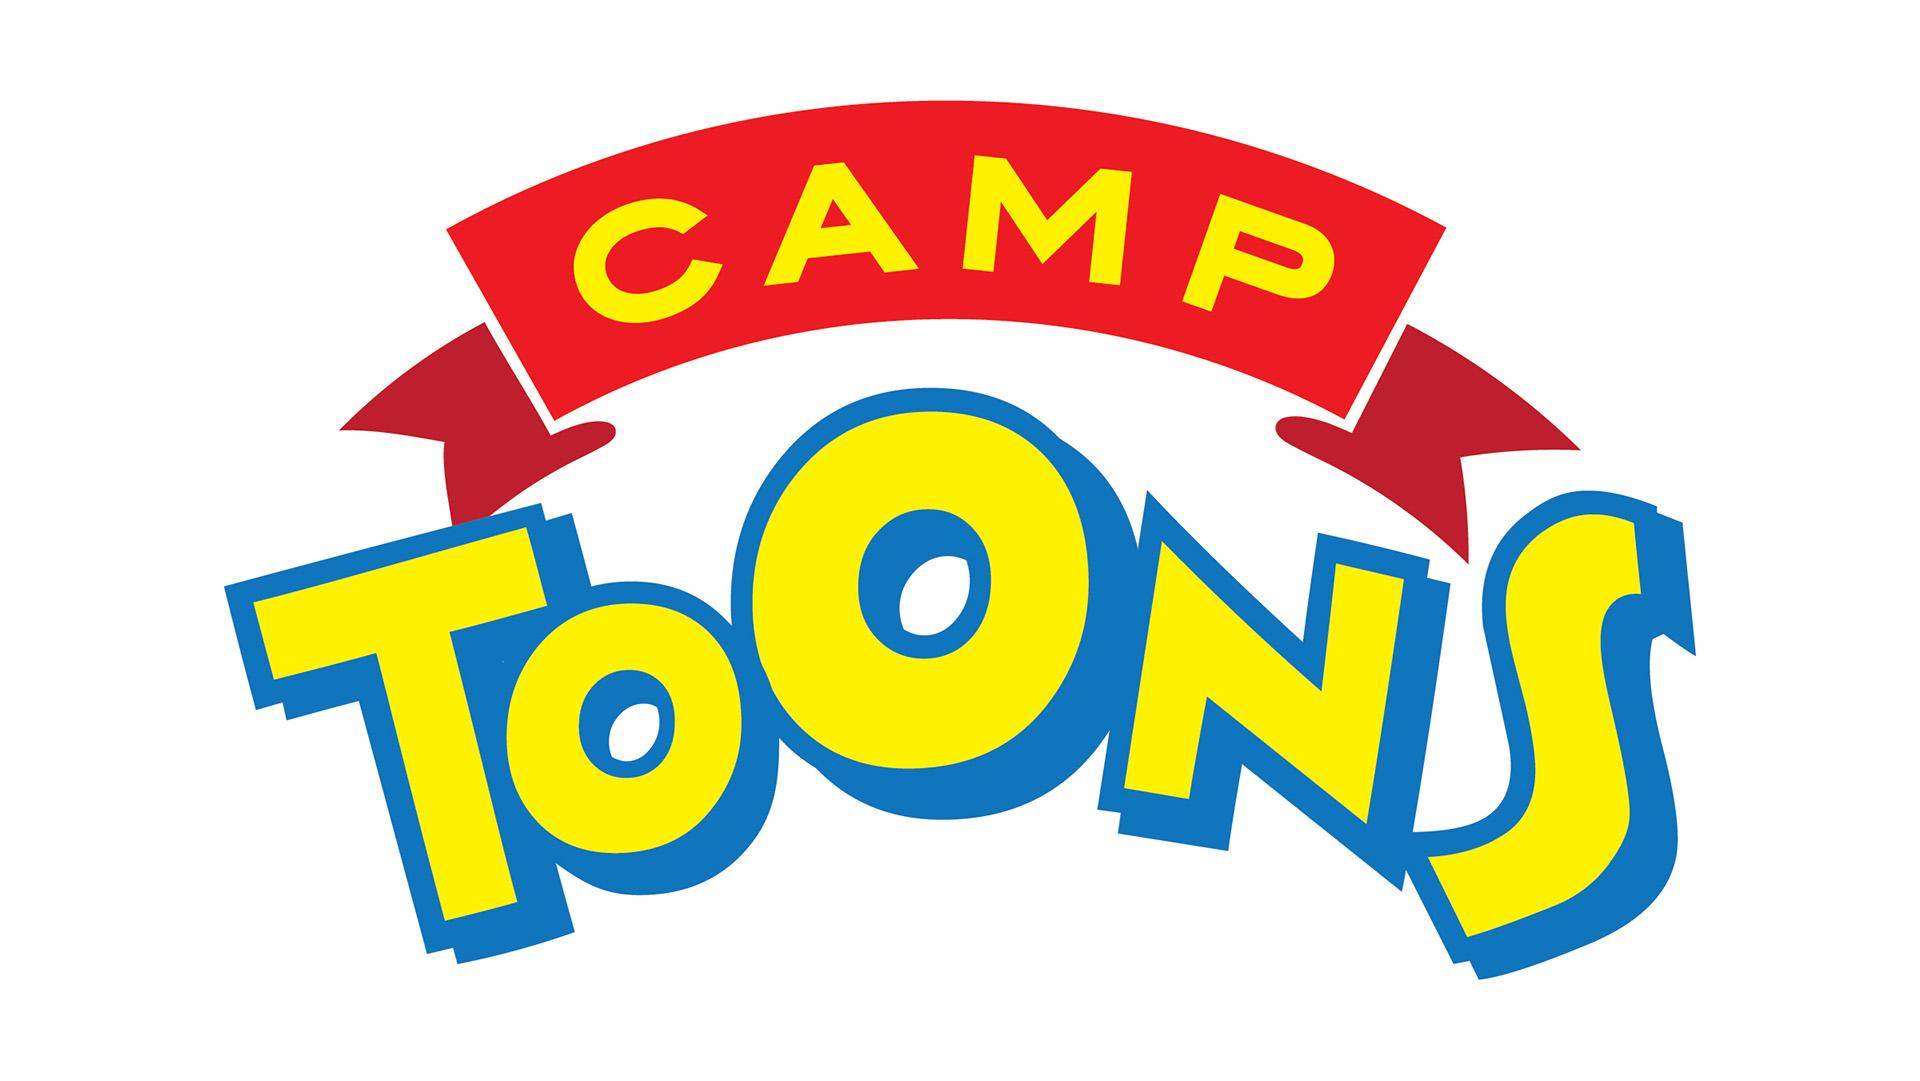 Camp Toons